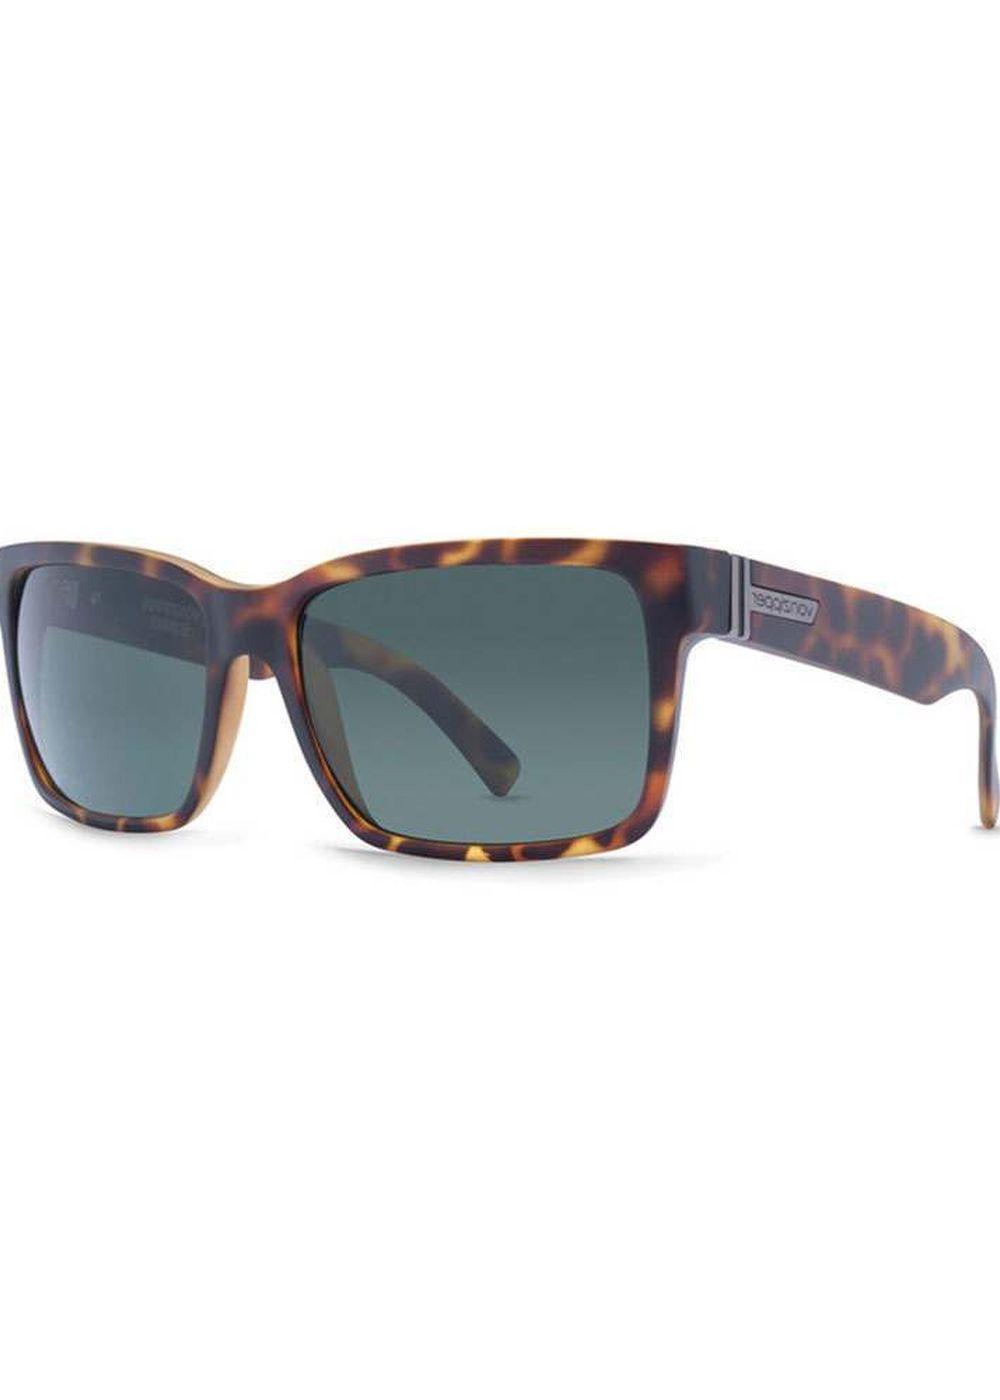 vonzipper-elmore-sunglasses-tort-satinvint-grey